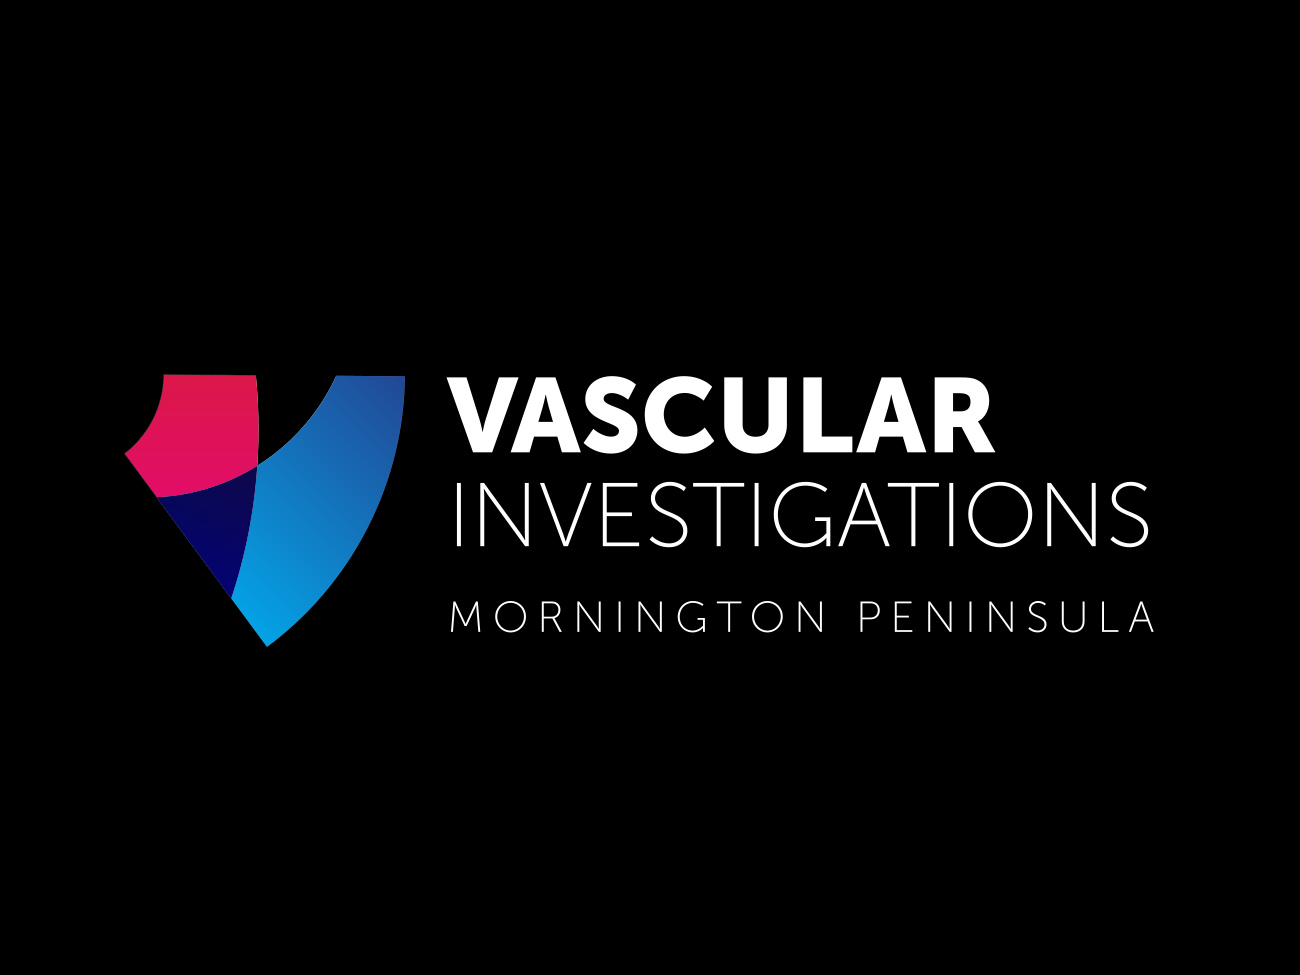 Vascular Investigations Logo Design